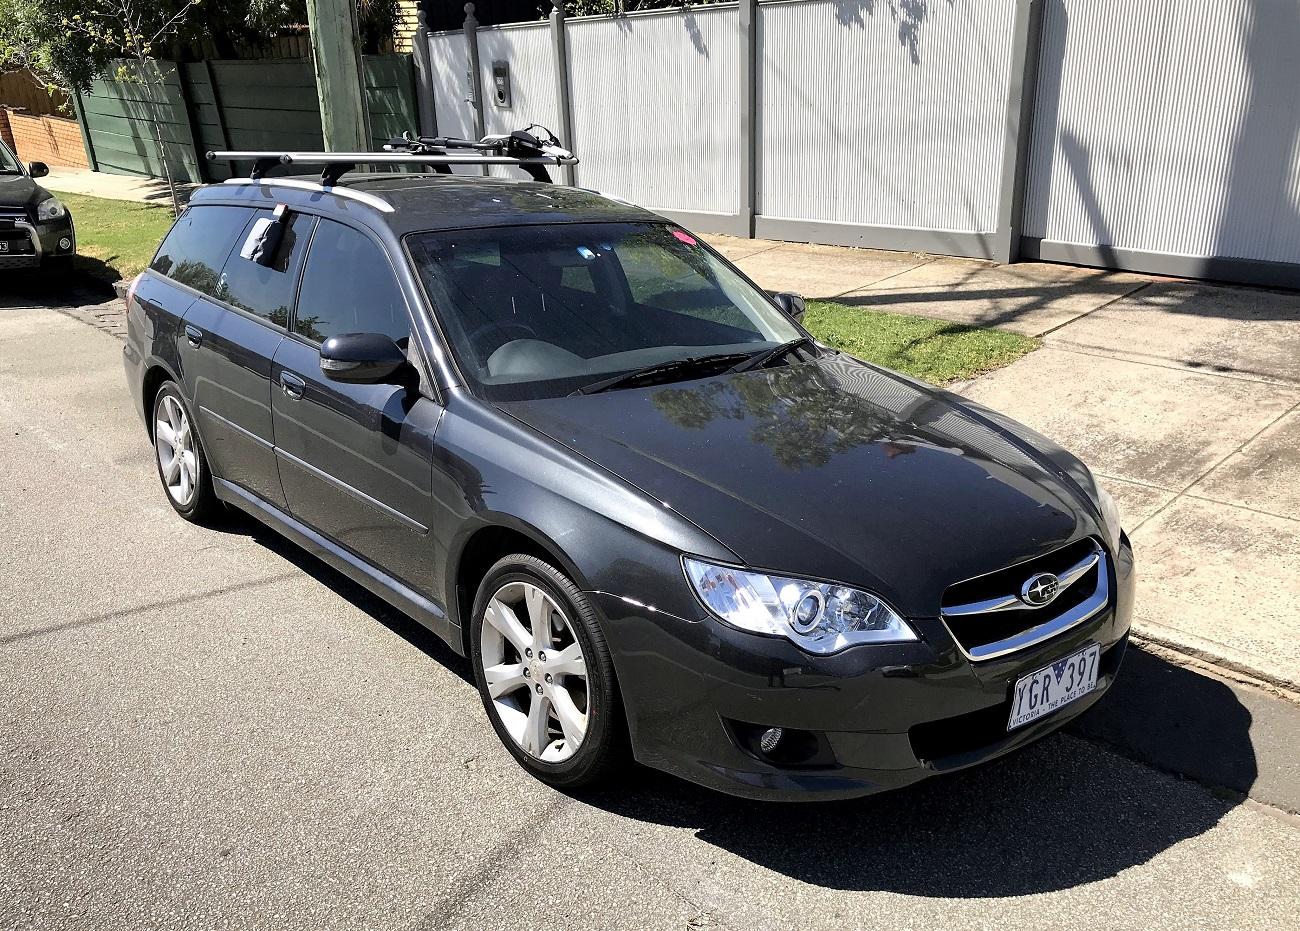 Picture of Alana's 2009 Subaru Liberty